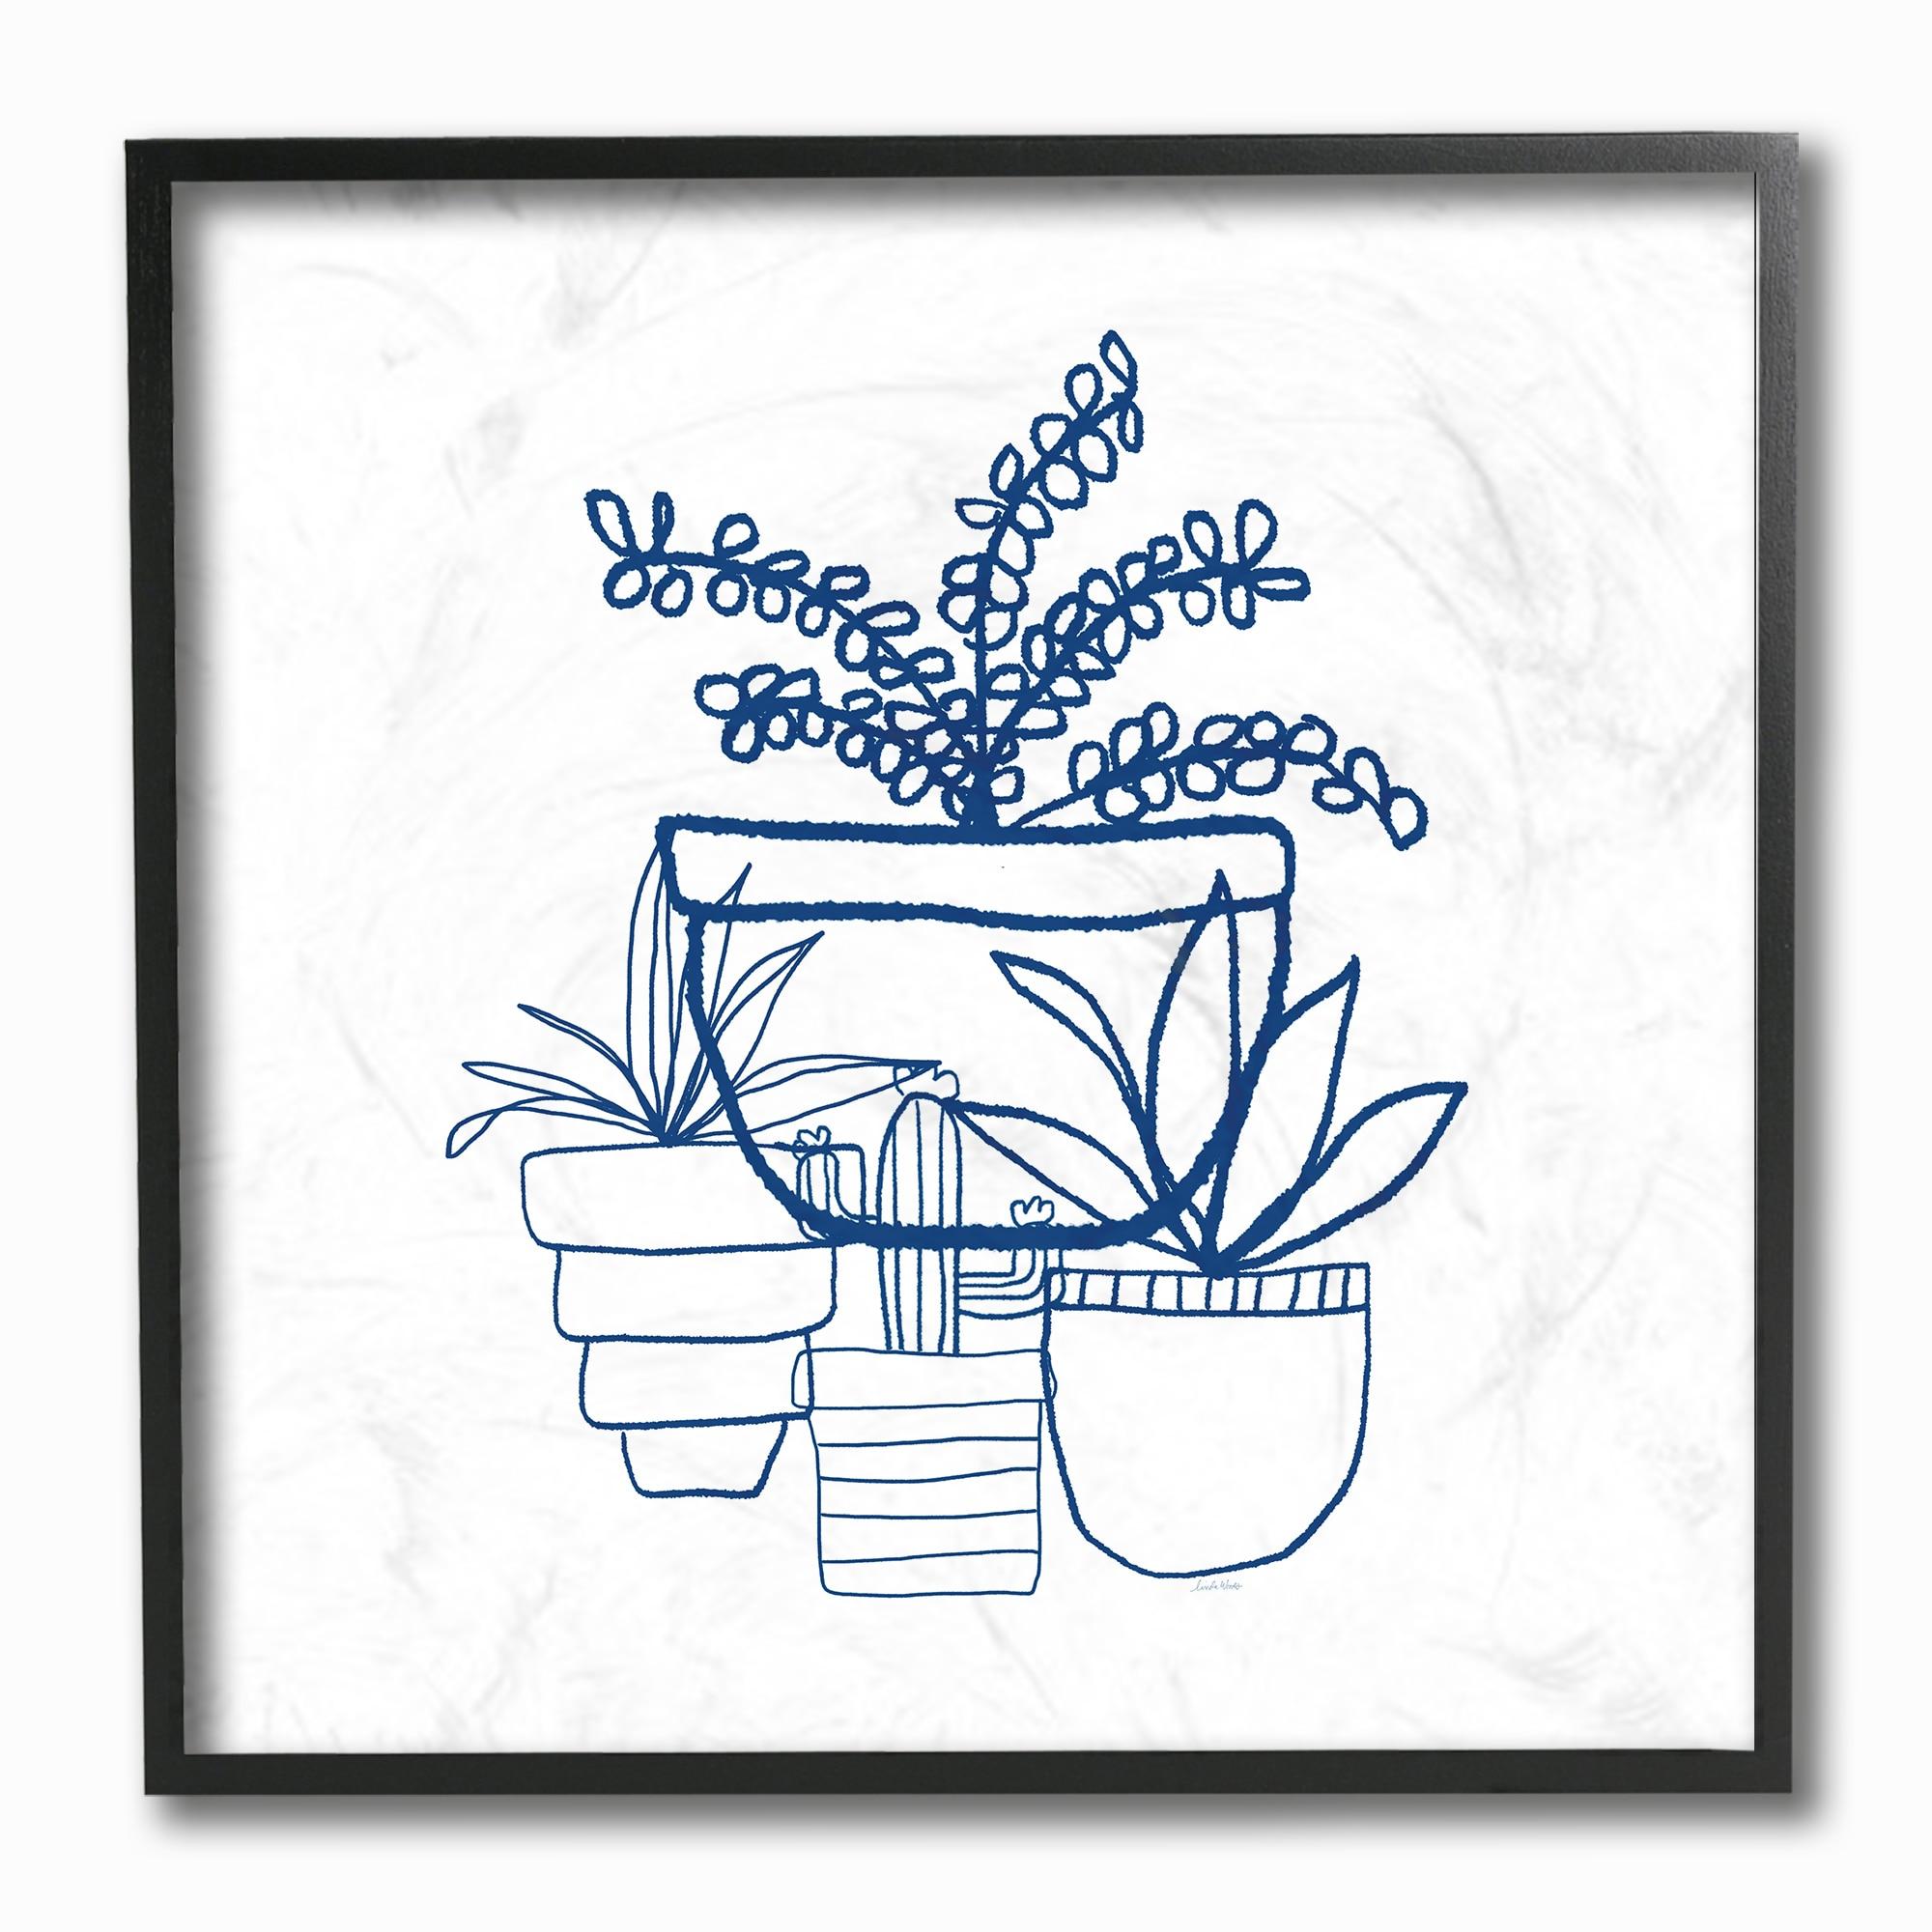 Indigo Succulent Line Drawing Framed Giclee Texturized Art Overstock 16304741